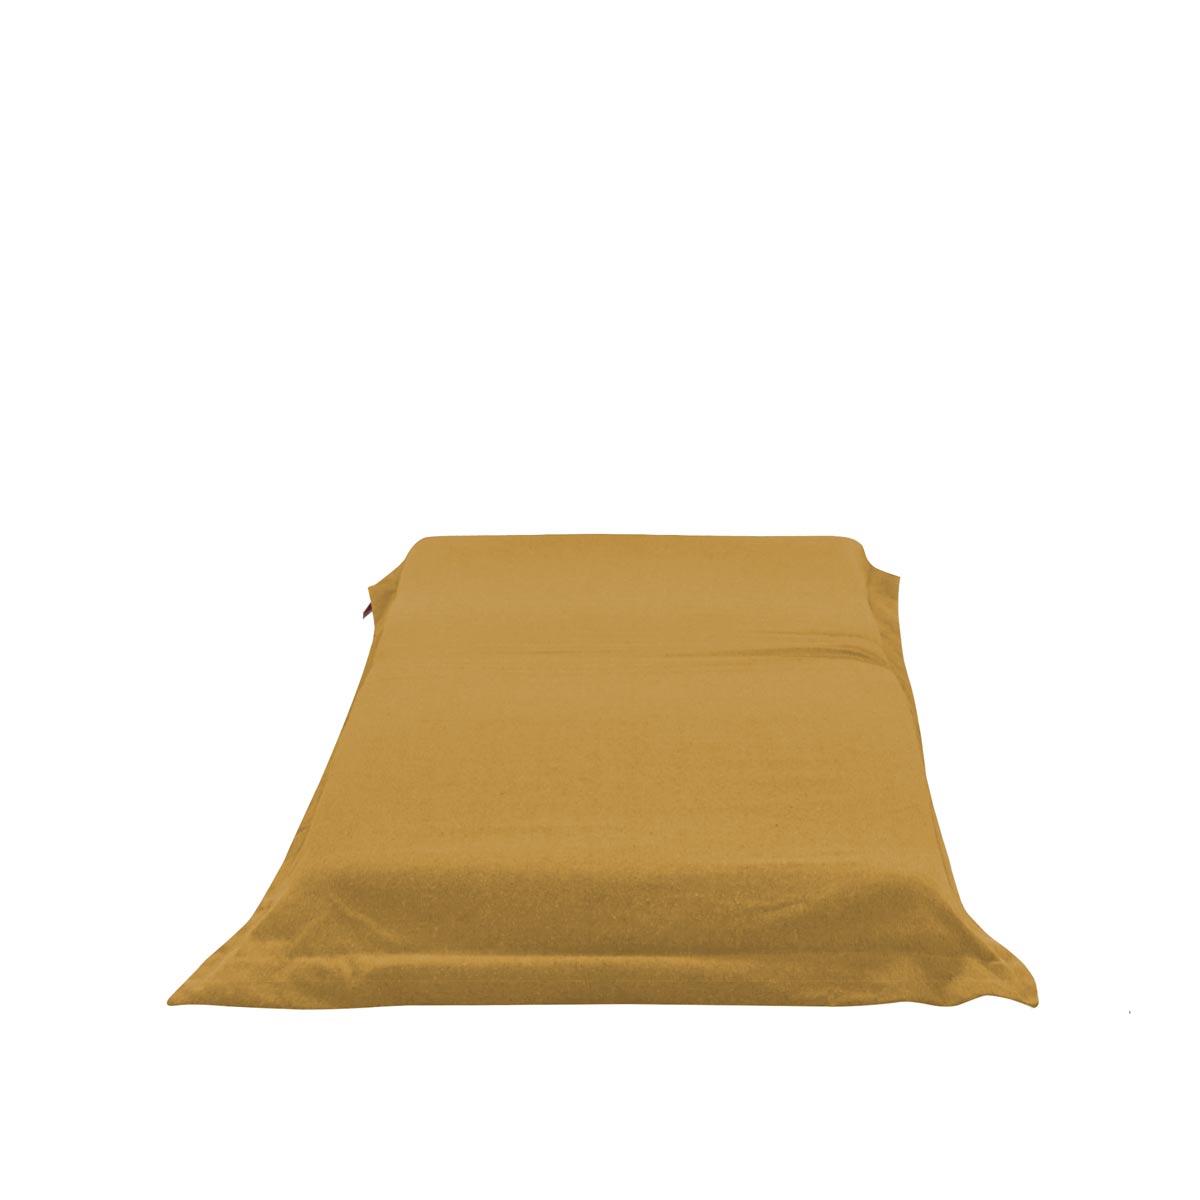 Pufe ClicClac Uno Lounge Tecido Ecolona Mostarda 01 01